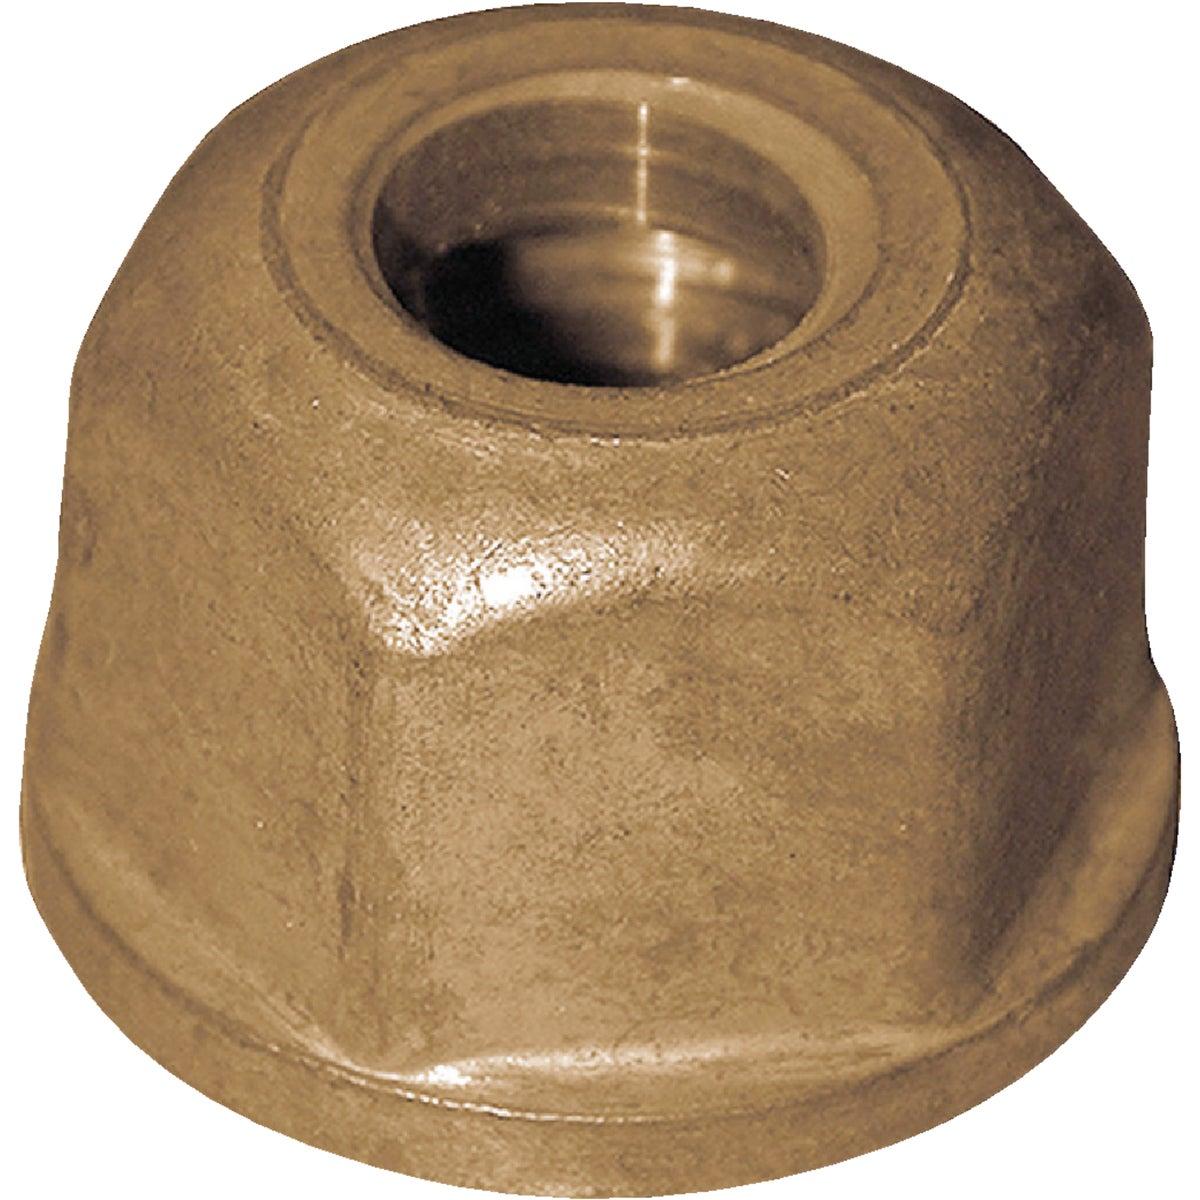 BASIN COUPLING NUT - B10-104 by Jones Stephens Corp